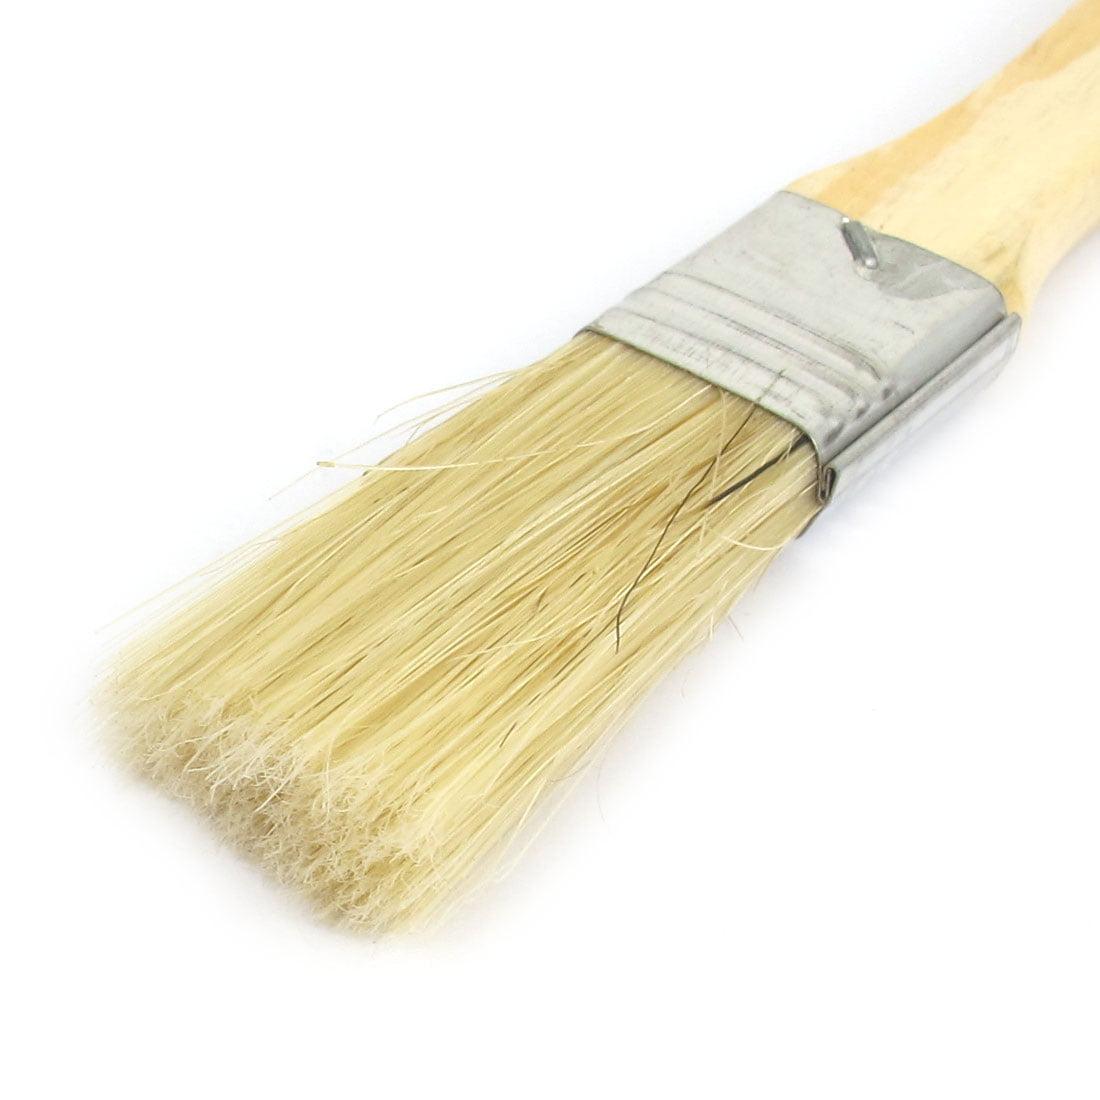 "1"" Width Soft Bristle Wooden Handle Painting Drawing Oil Paint Brush Pen 5pcs - image 1 of 2"